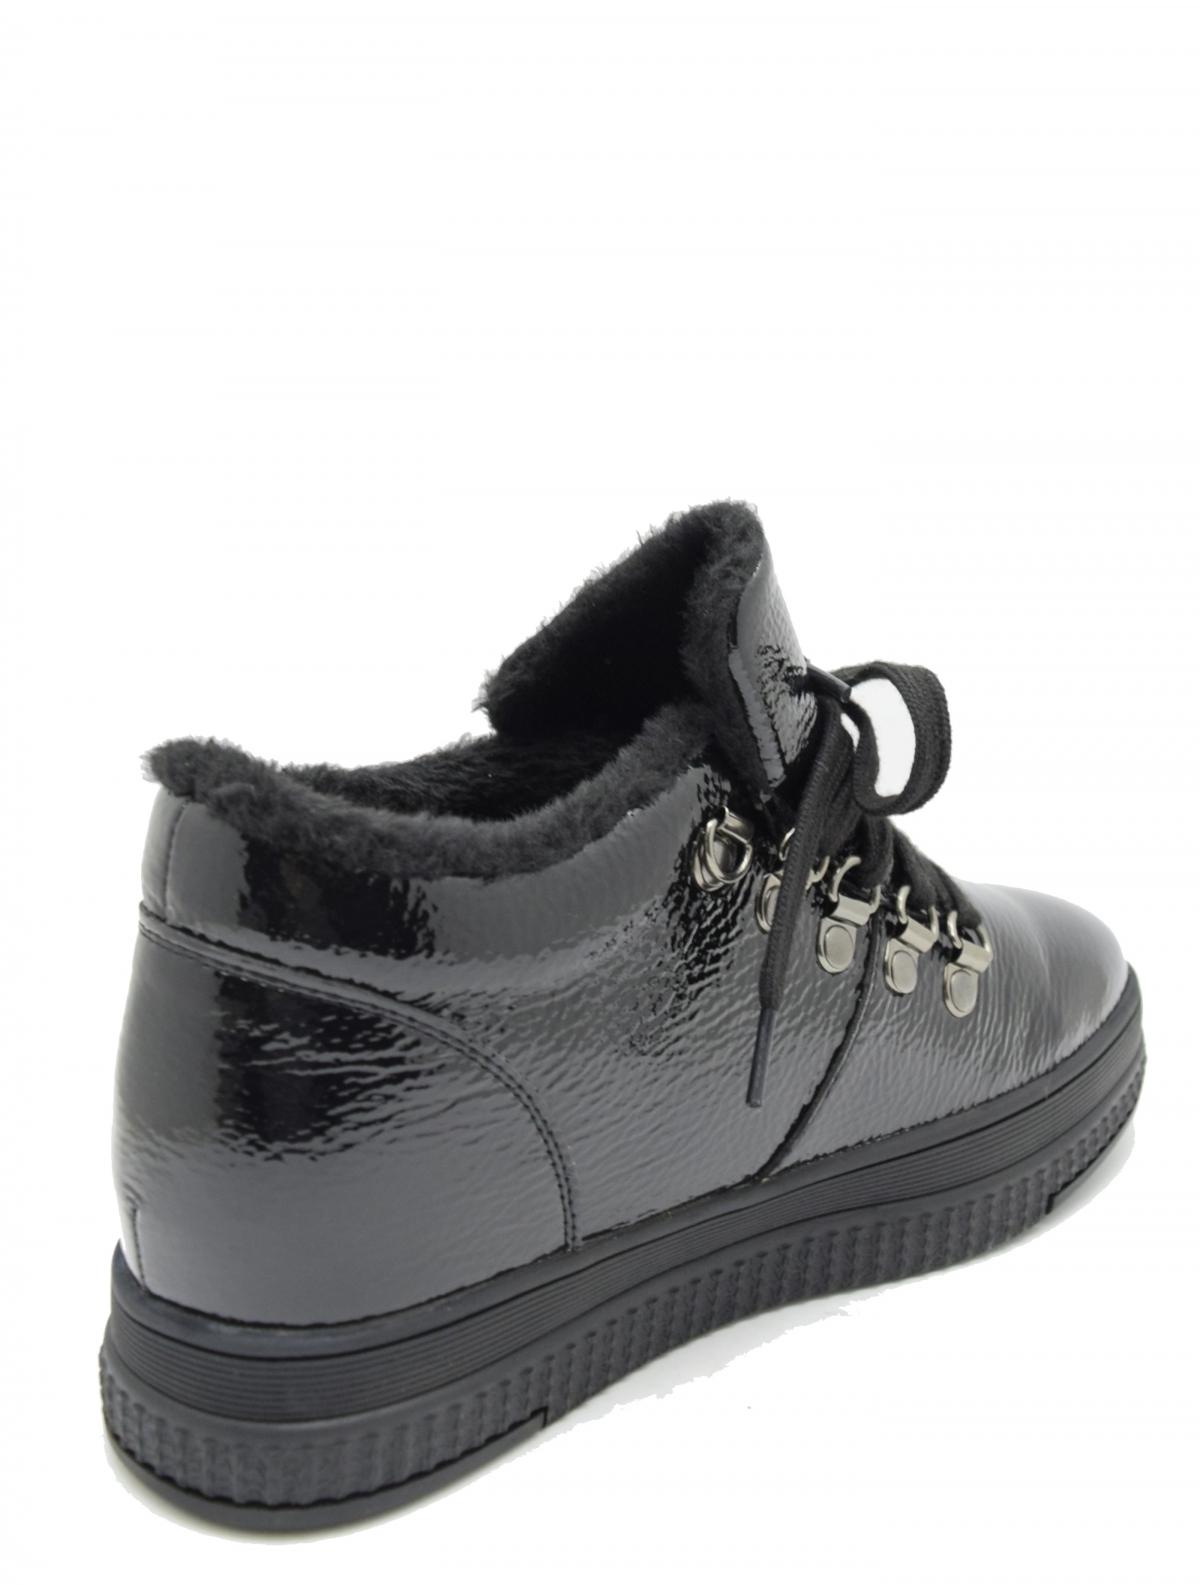 Glam Forever 395-182-1L женские ботинки